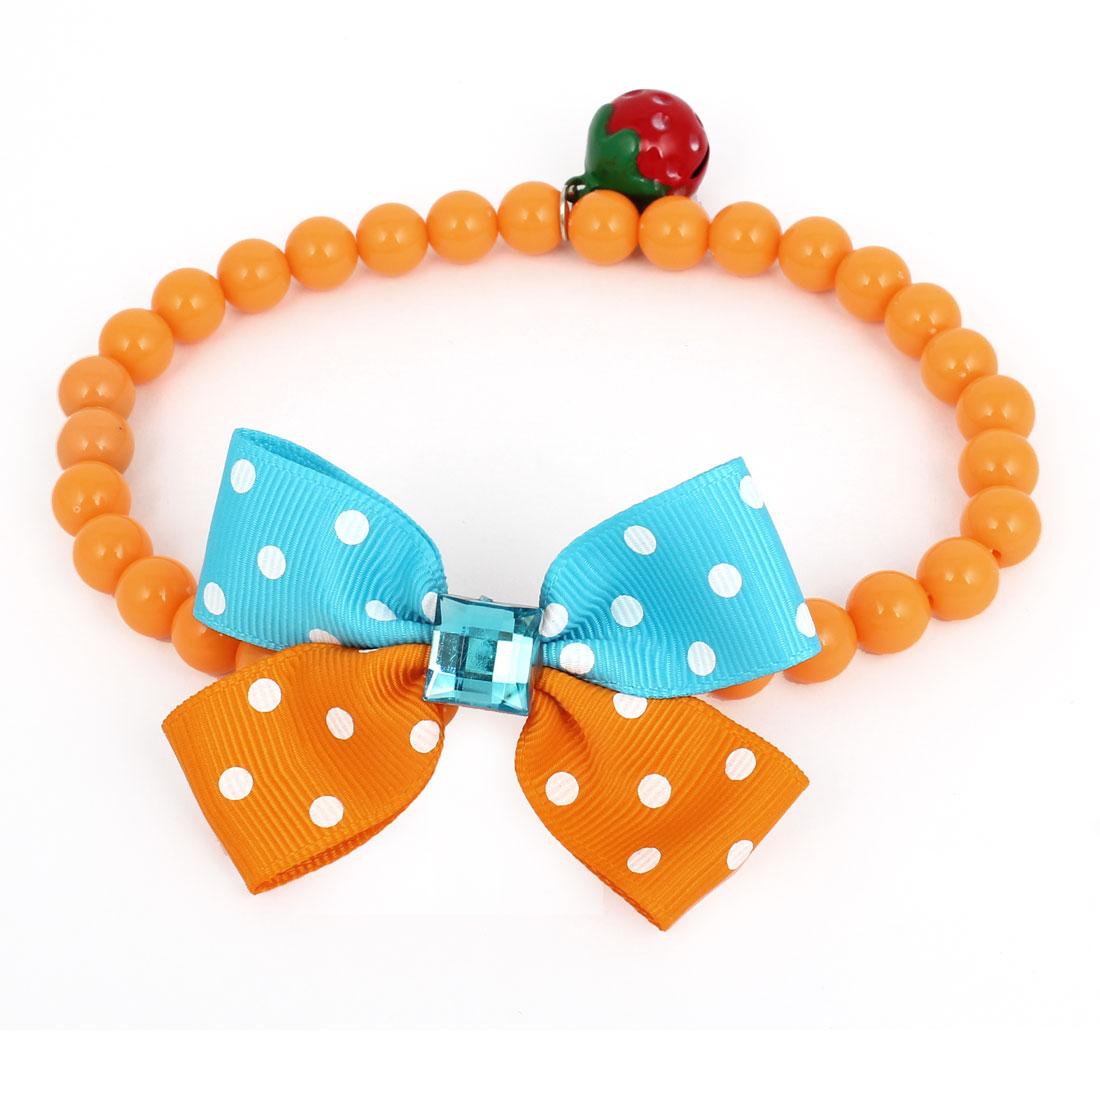 Metal Bell Pendant Bowtie Accent Pet Dog Plastic Round Beads Collar Necklace Orange Blue L